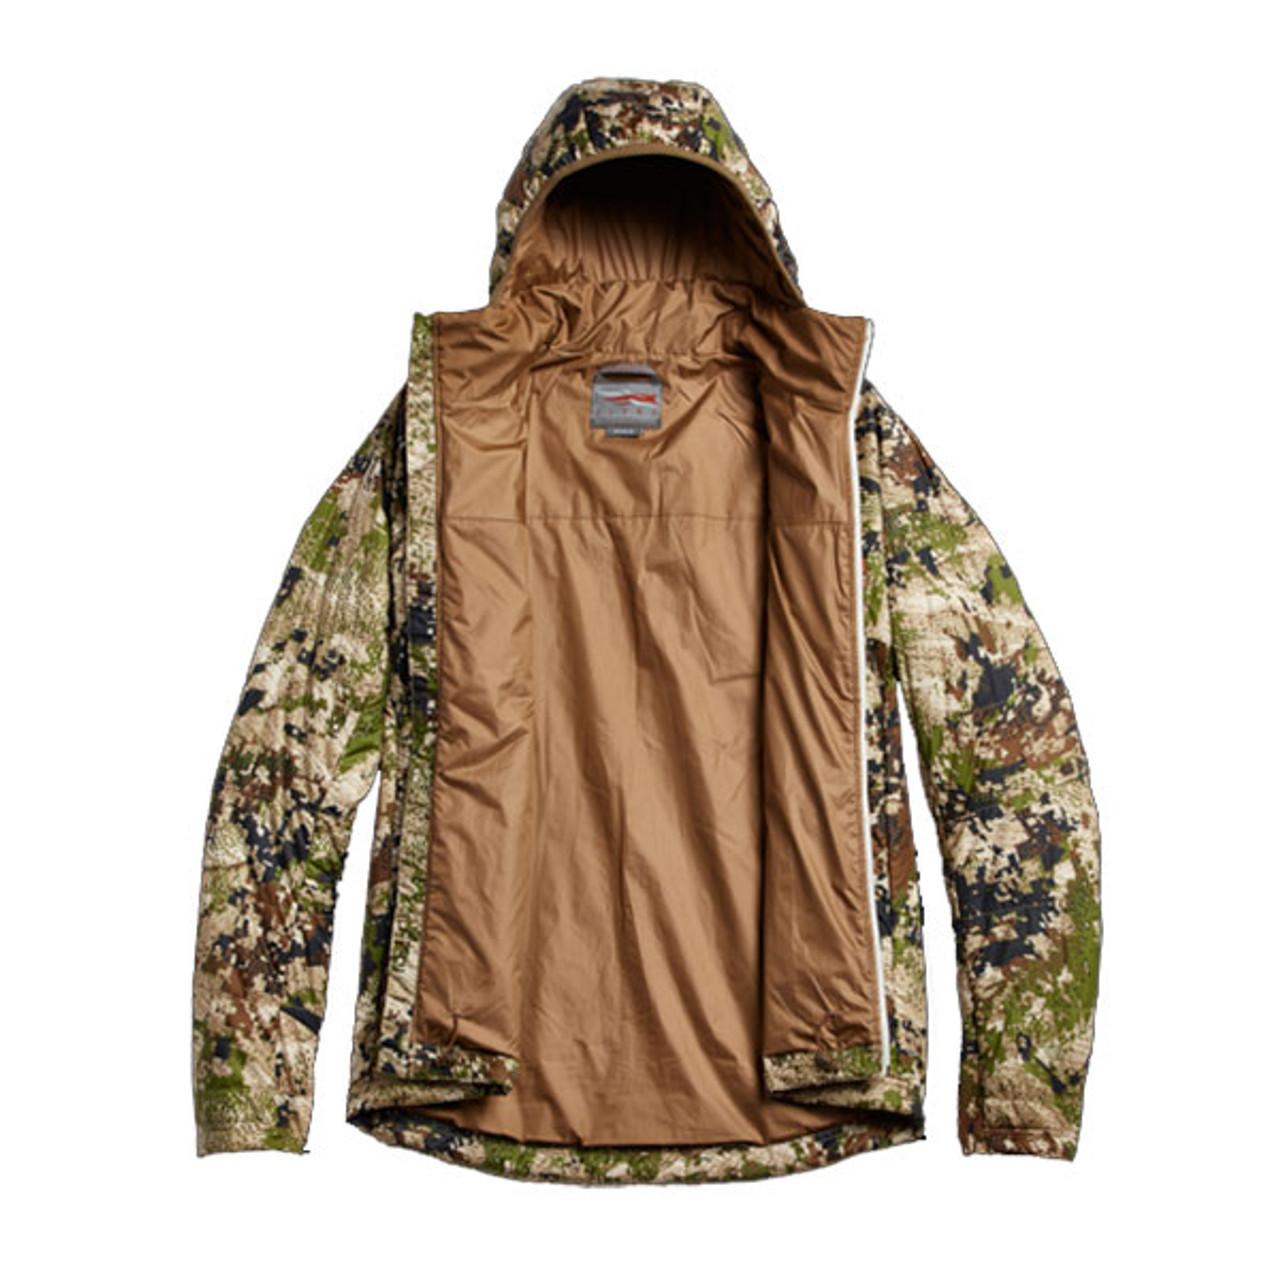 Sitka Gear Kelvin Aerolite Optifade Subalpine Jacket